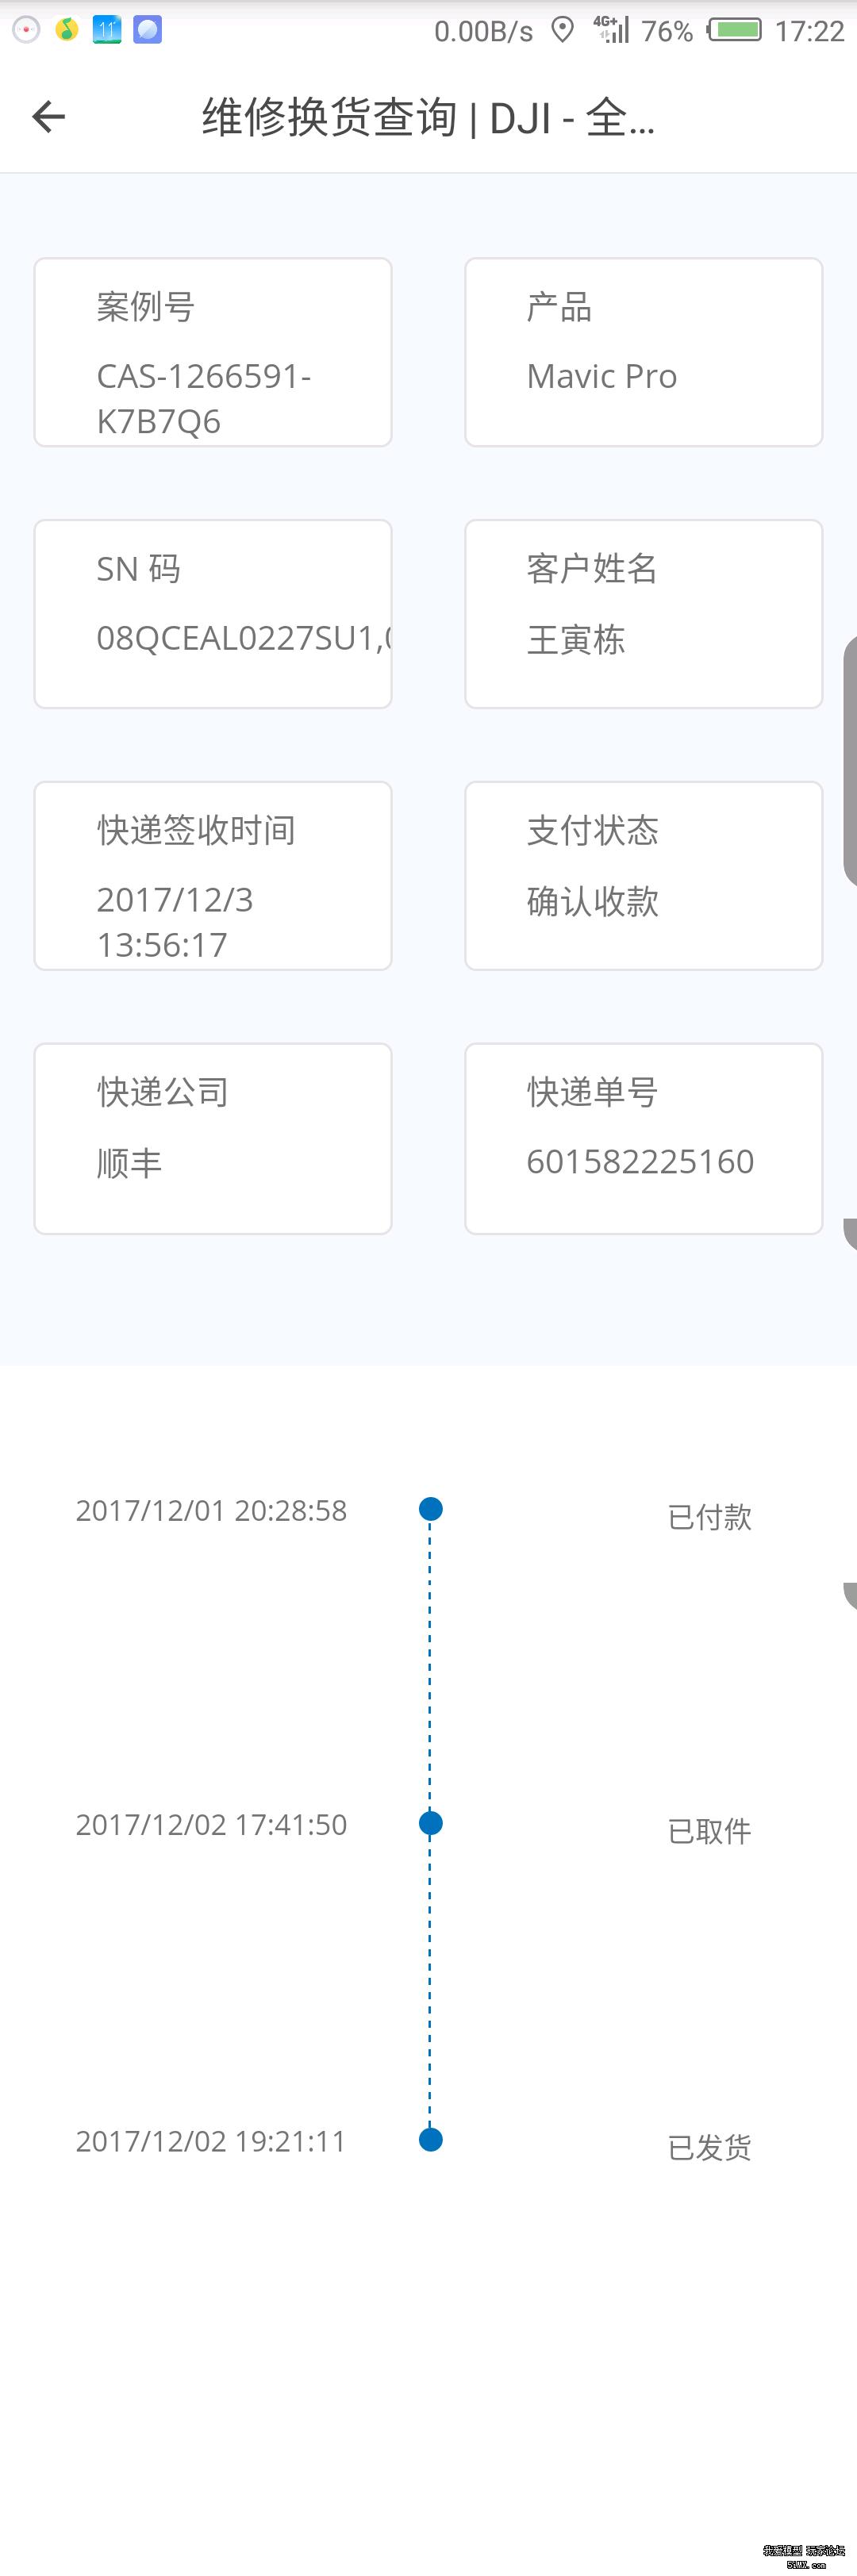 Screenshot_2018-01-14-17-22-30.png